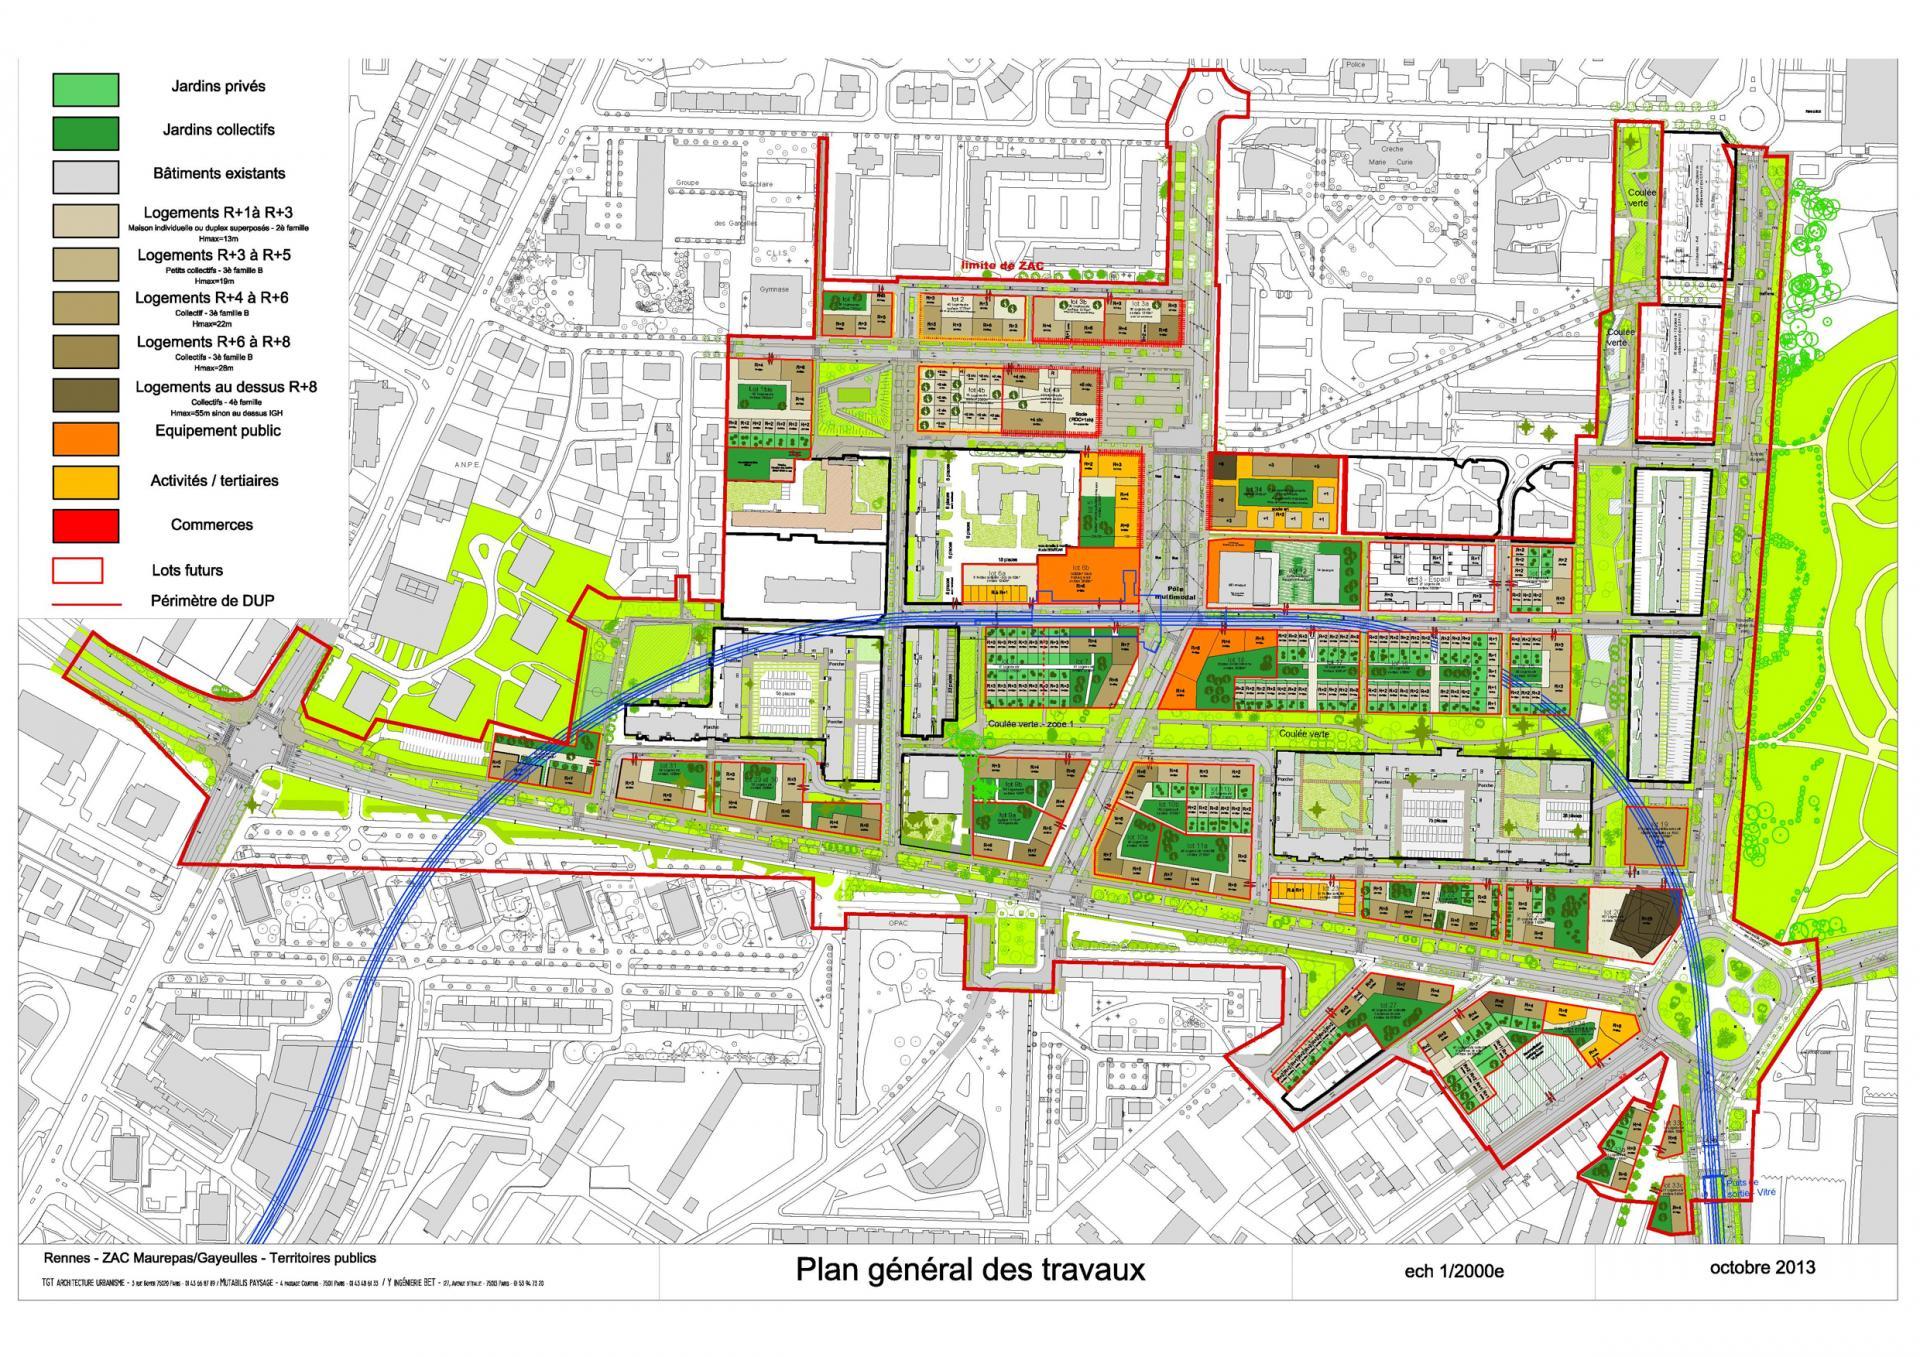 ZAC Maurepas-Gayeulles - Plan general des travaux